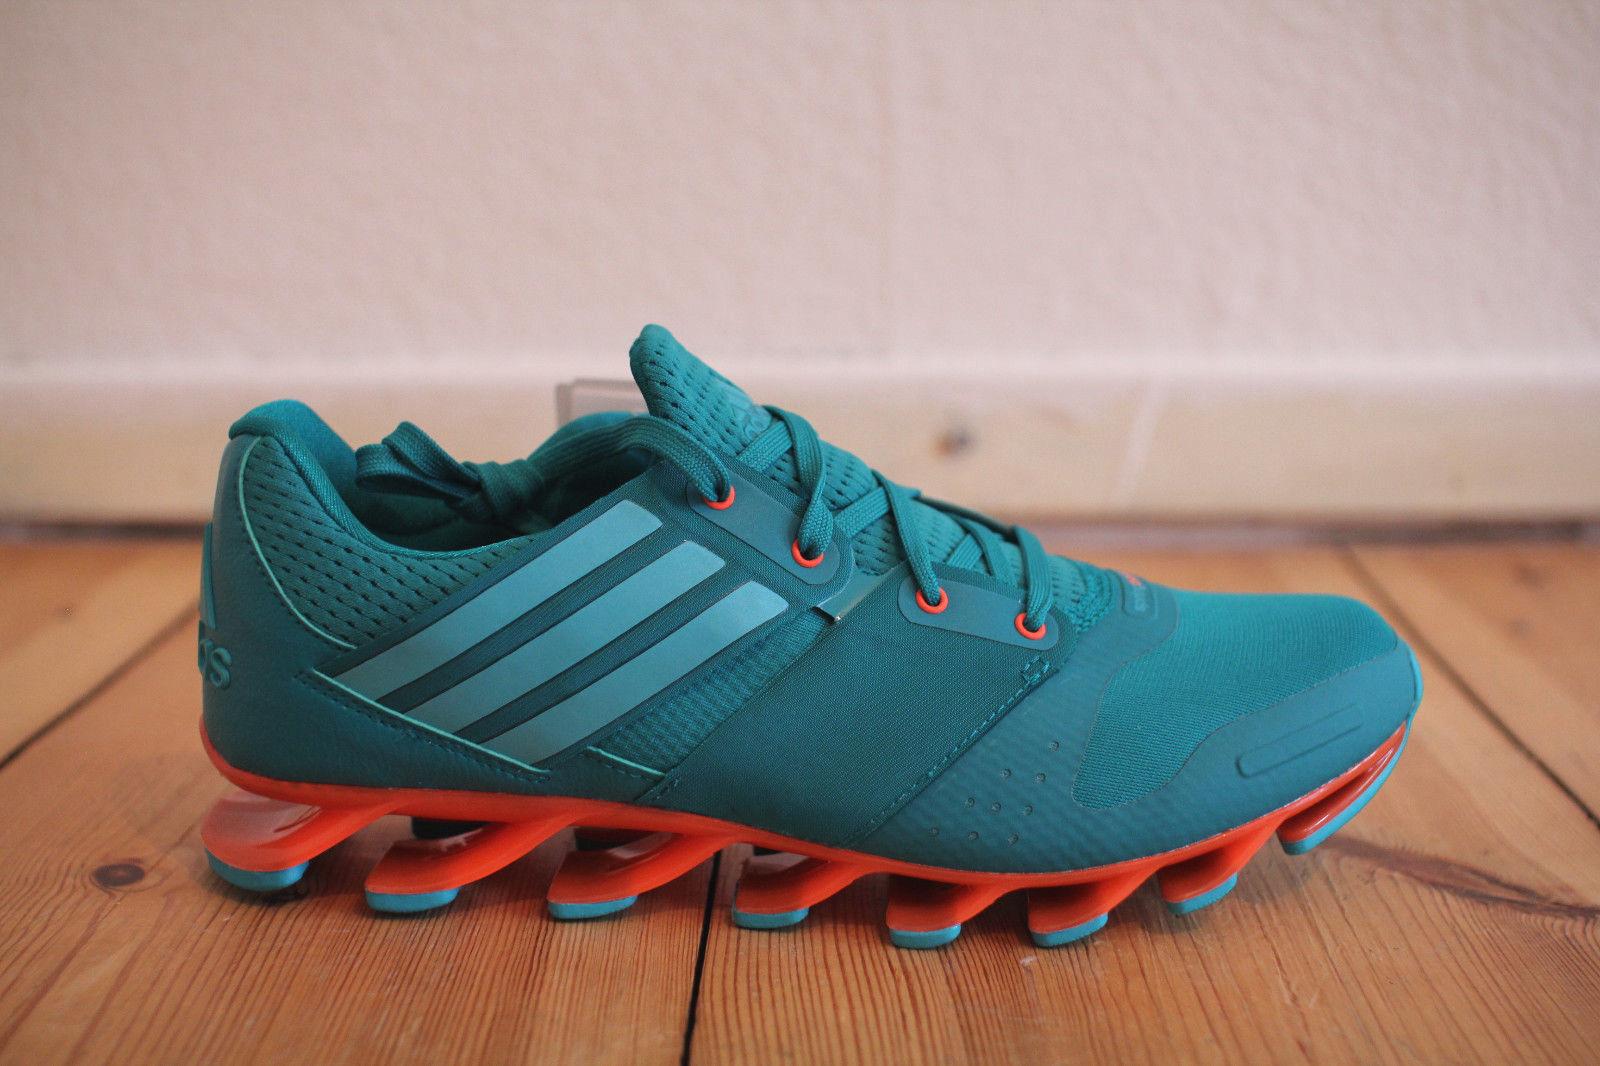 Adidas Springblade Solyce Grün Gr. 42,43,44,45  NEU & OVP